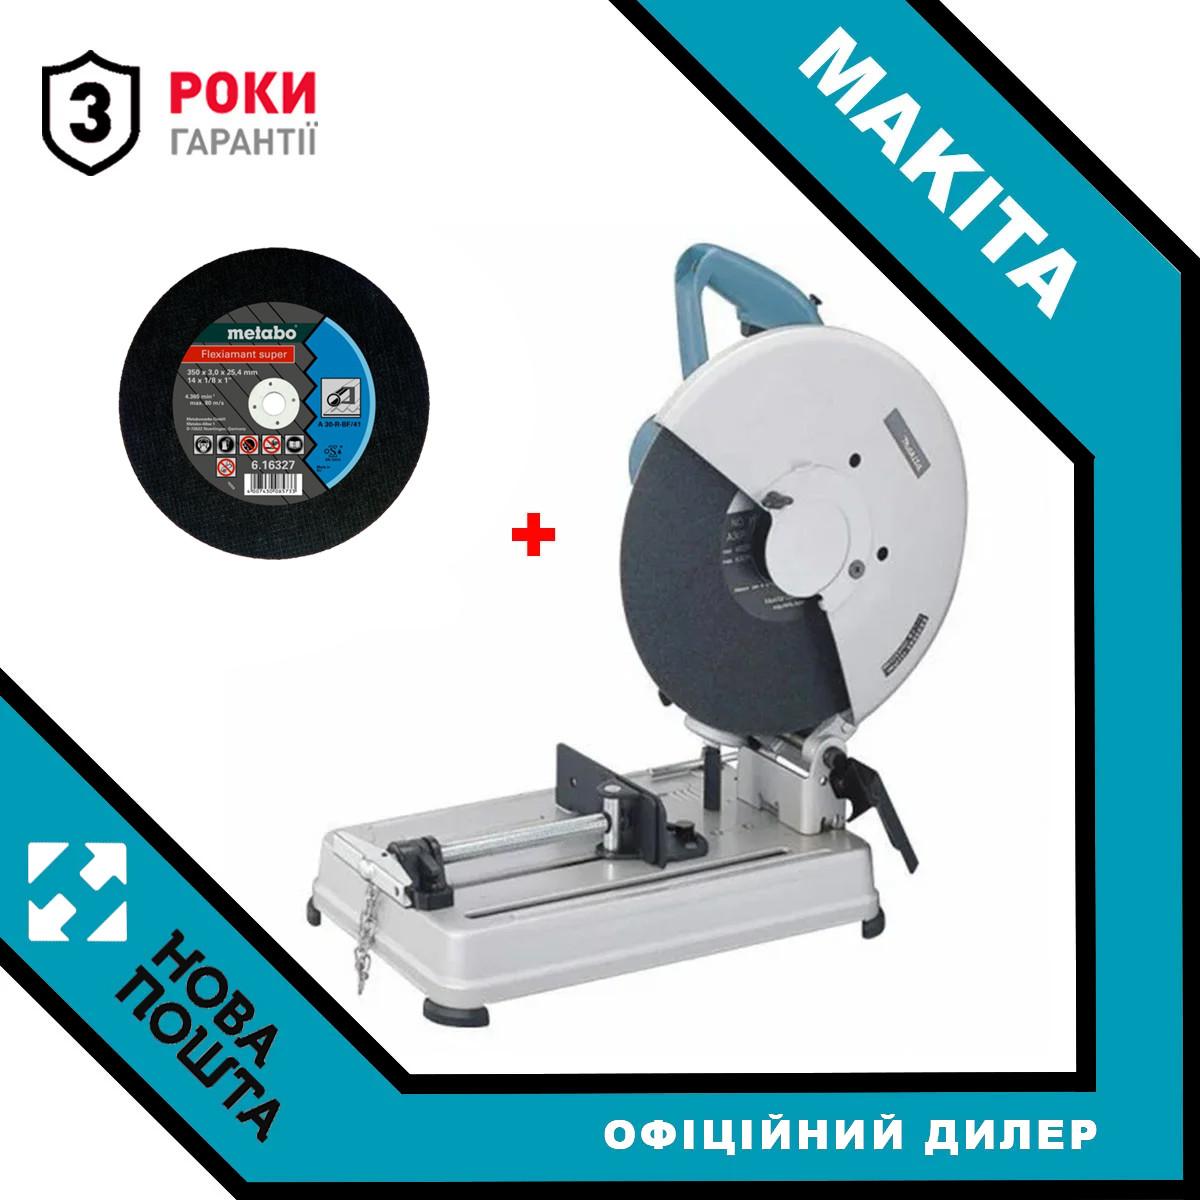 Монтажна Пила Makita 2414NB + в подарунок круг по металу Metabo!